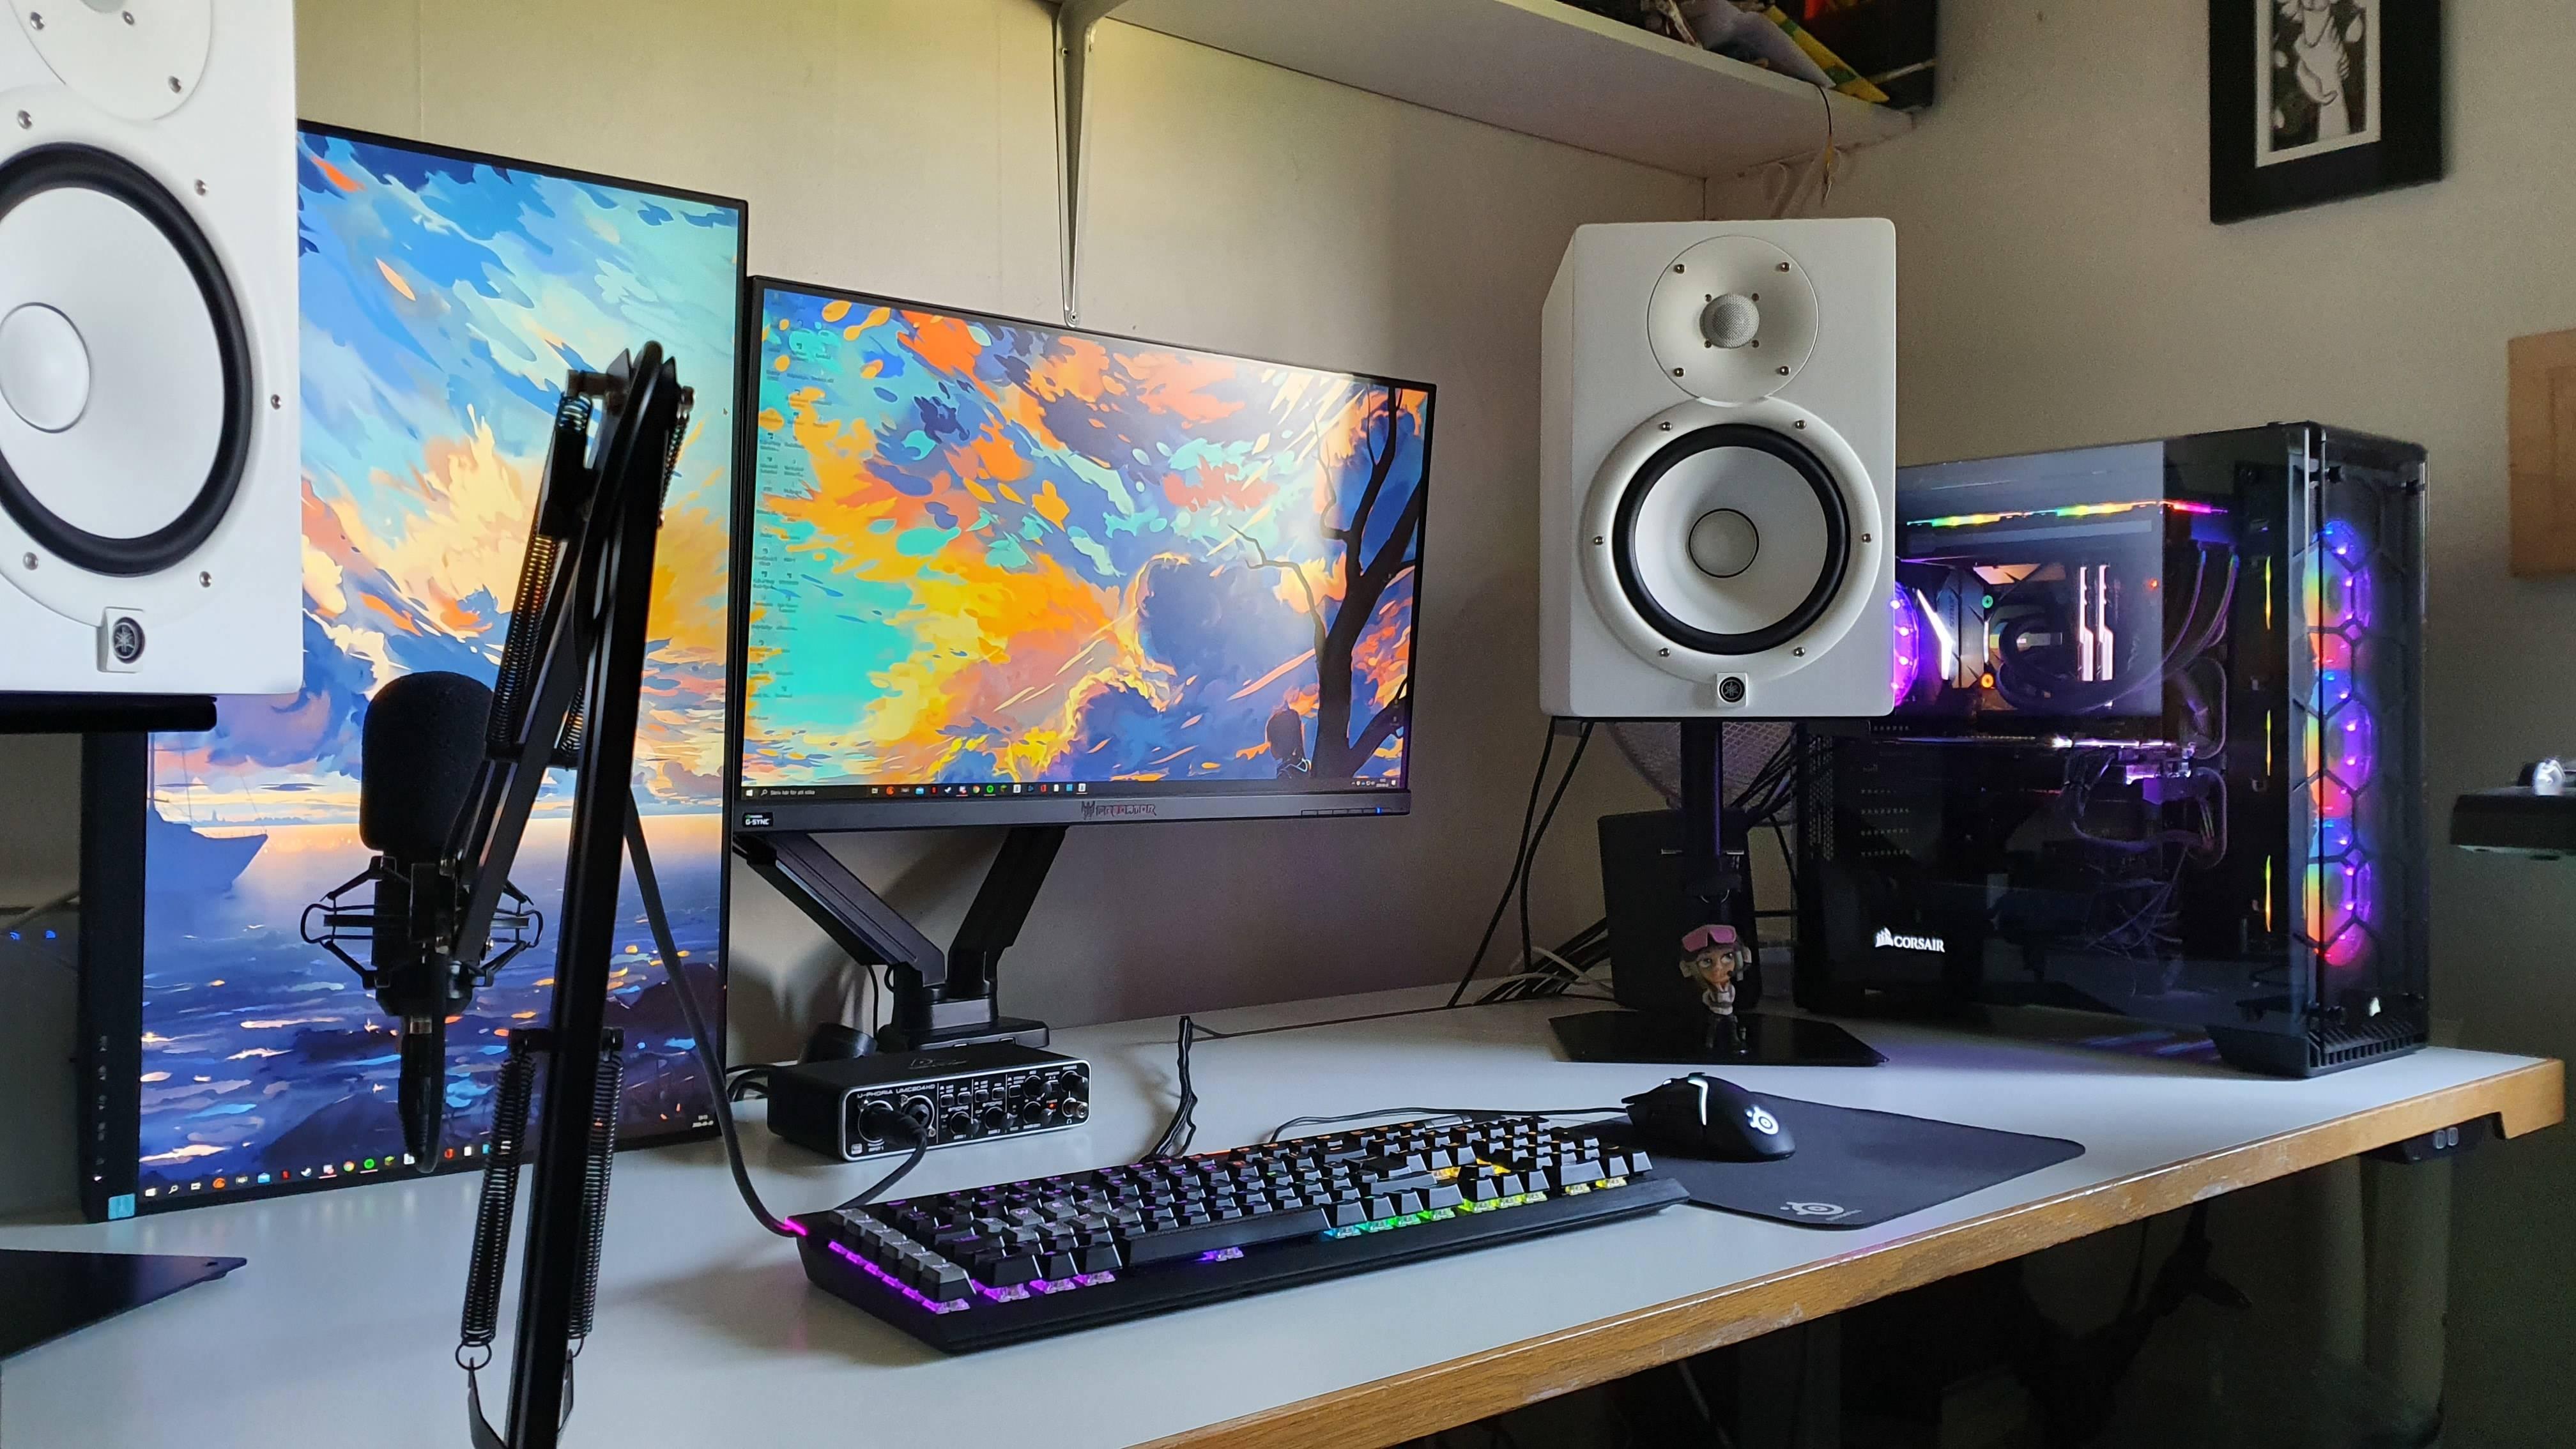 ViggoLuke's Setup - Clean dual monitor setup | Scooget